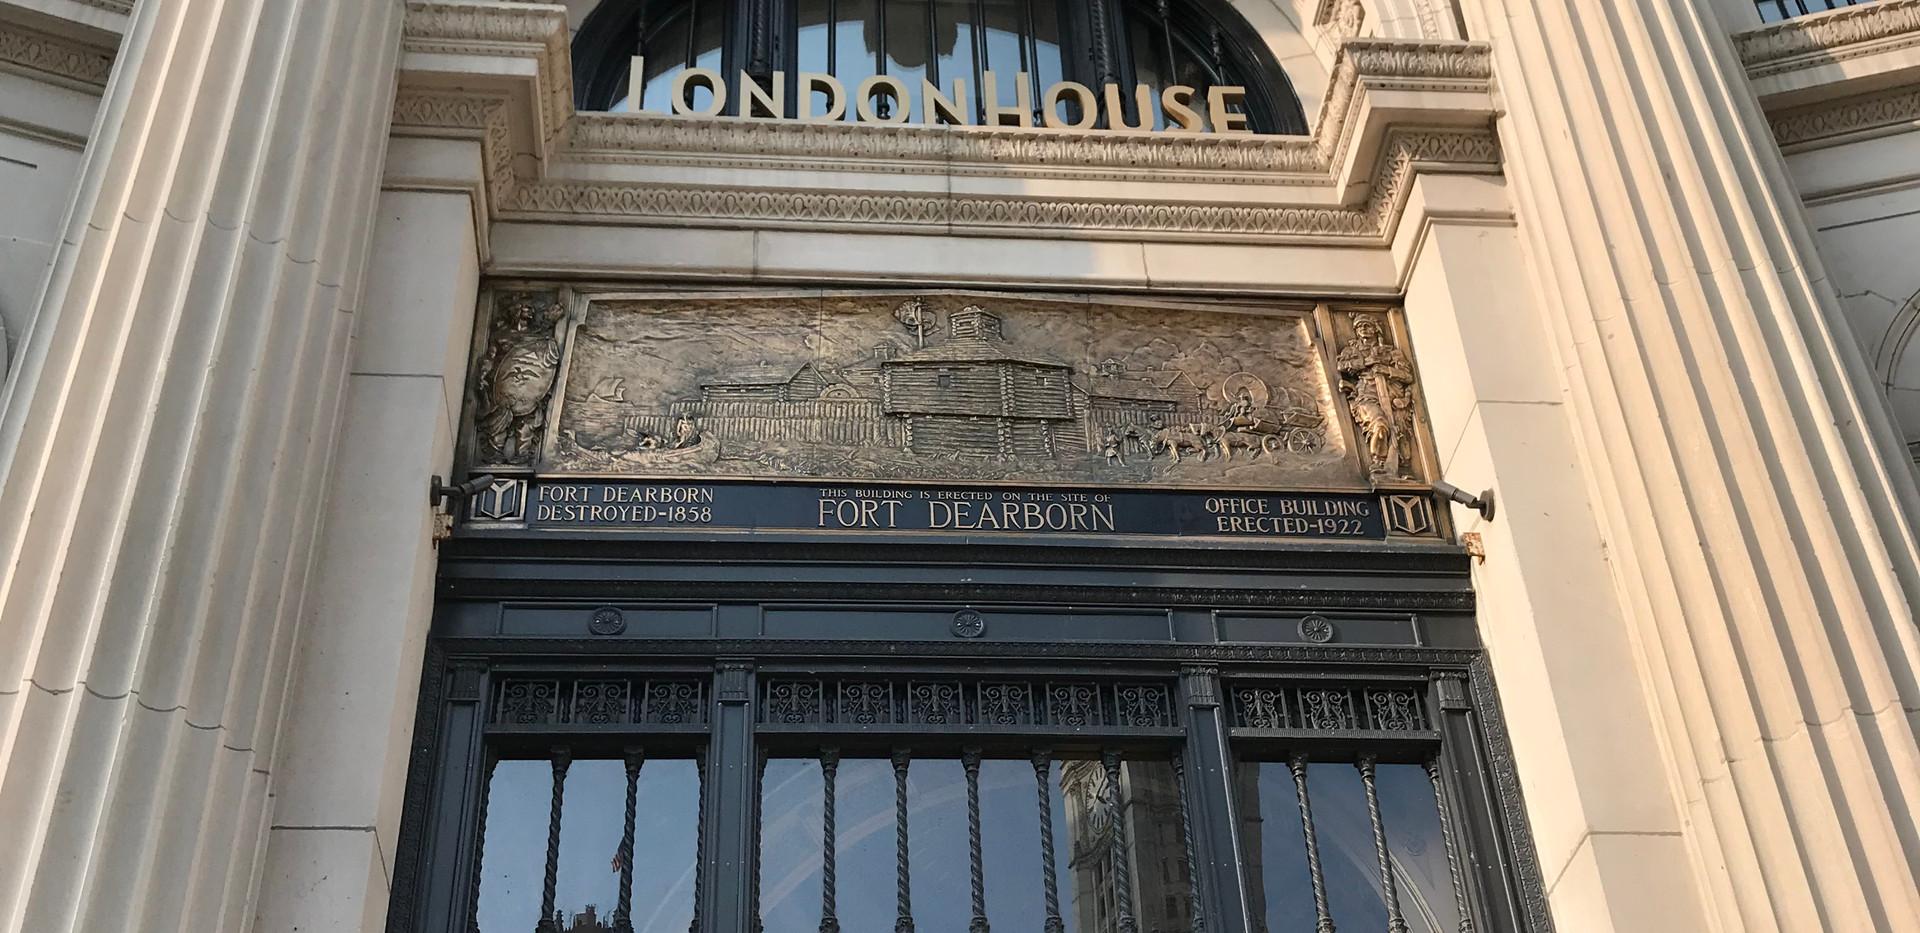 London House, Chicago, IL